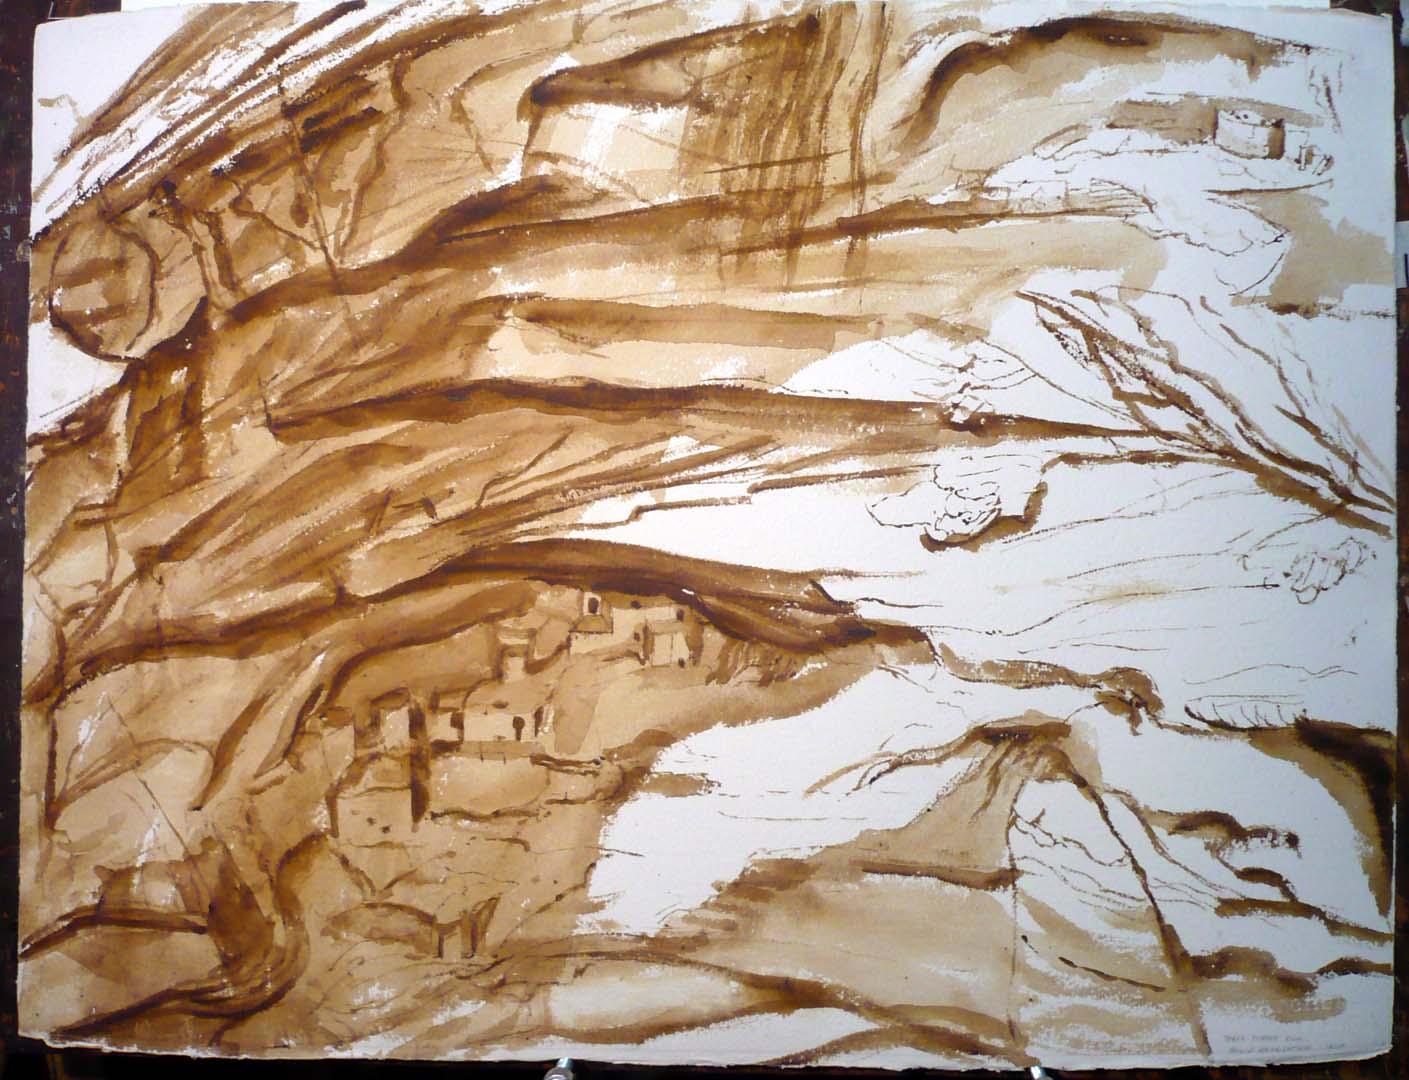 1975 Taree Turkey Ruin Sepia Wash on Paper 22.375 x 19.5